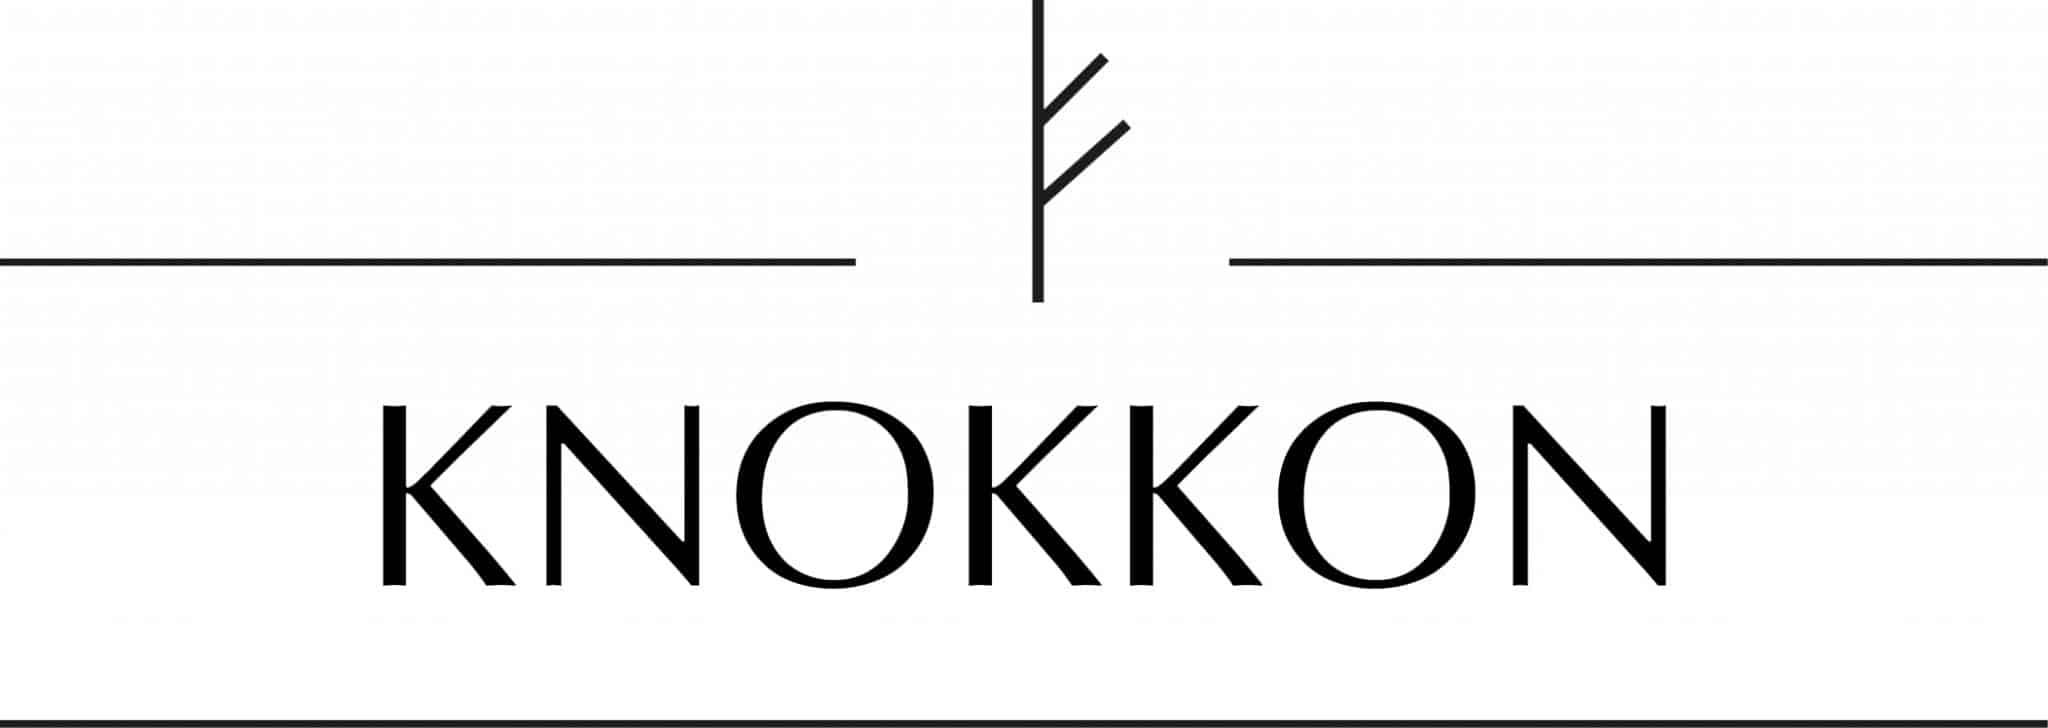 Knokkon ekologiset kankaat logo